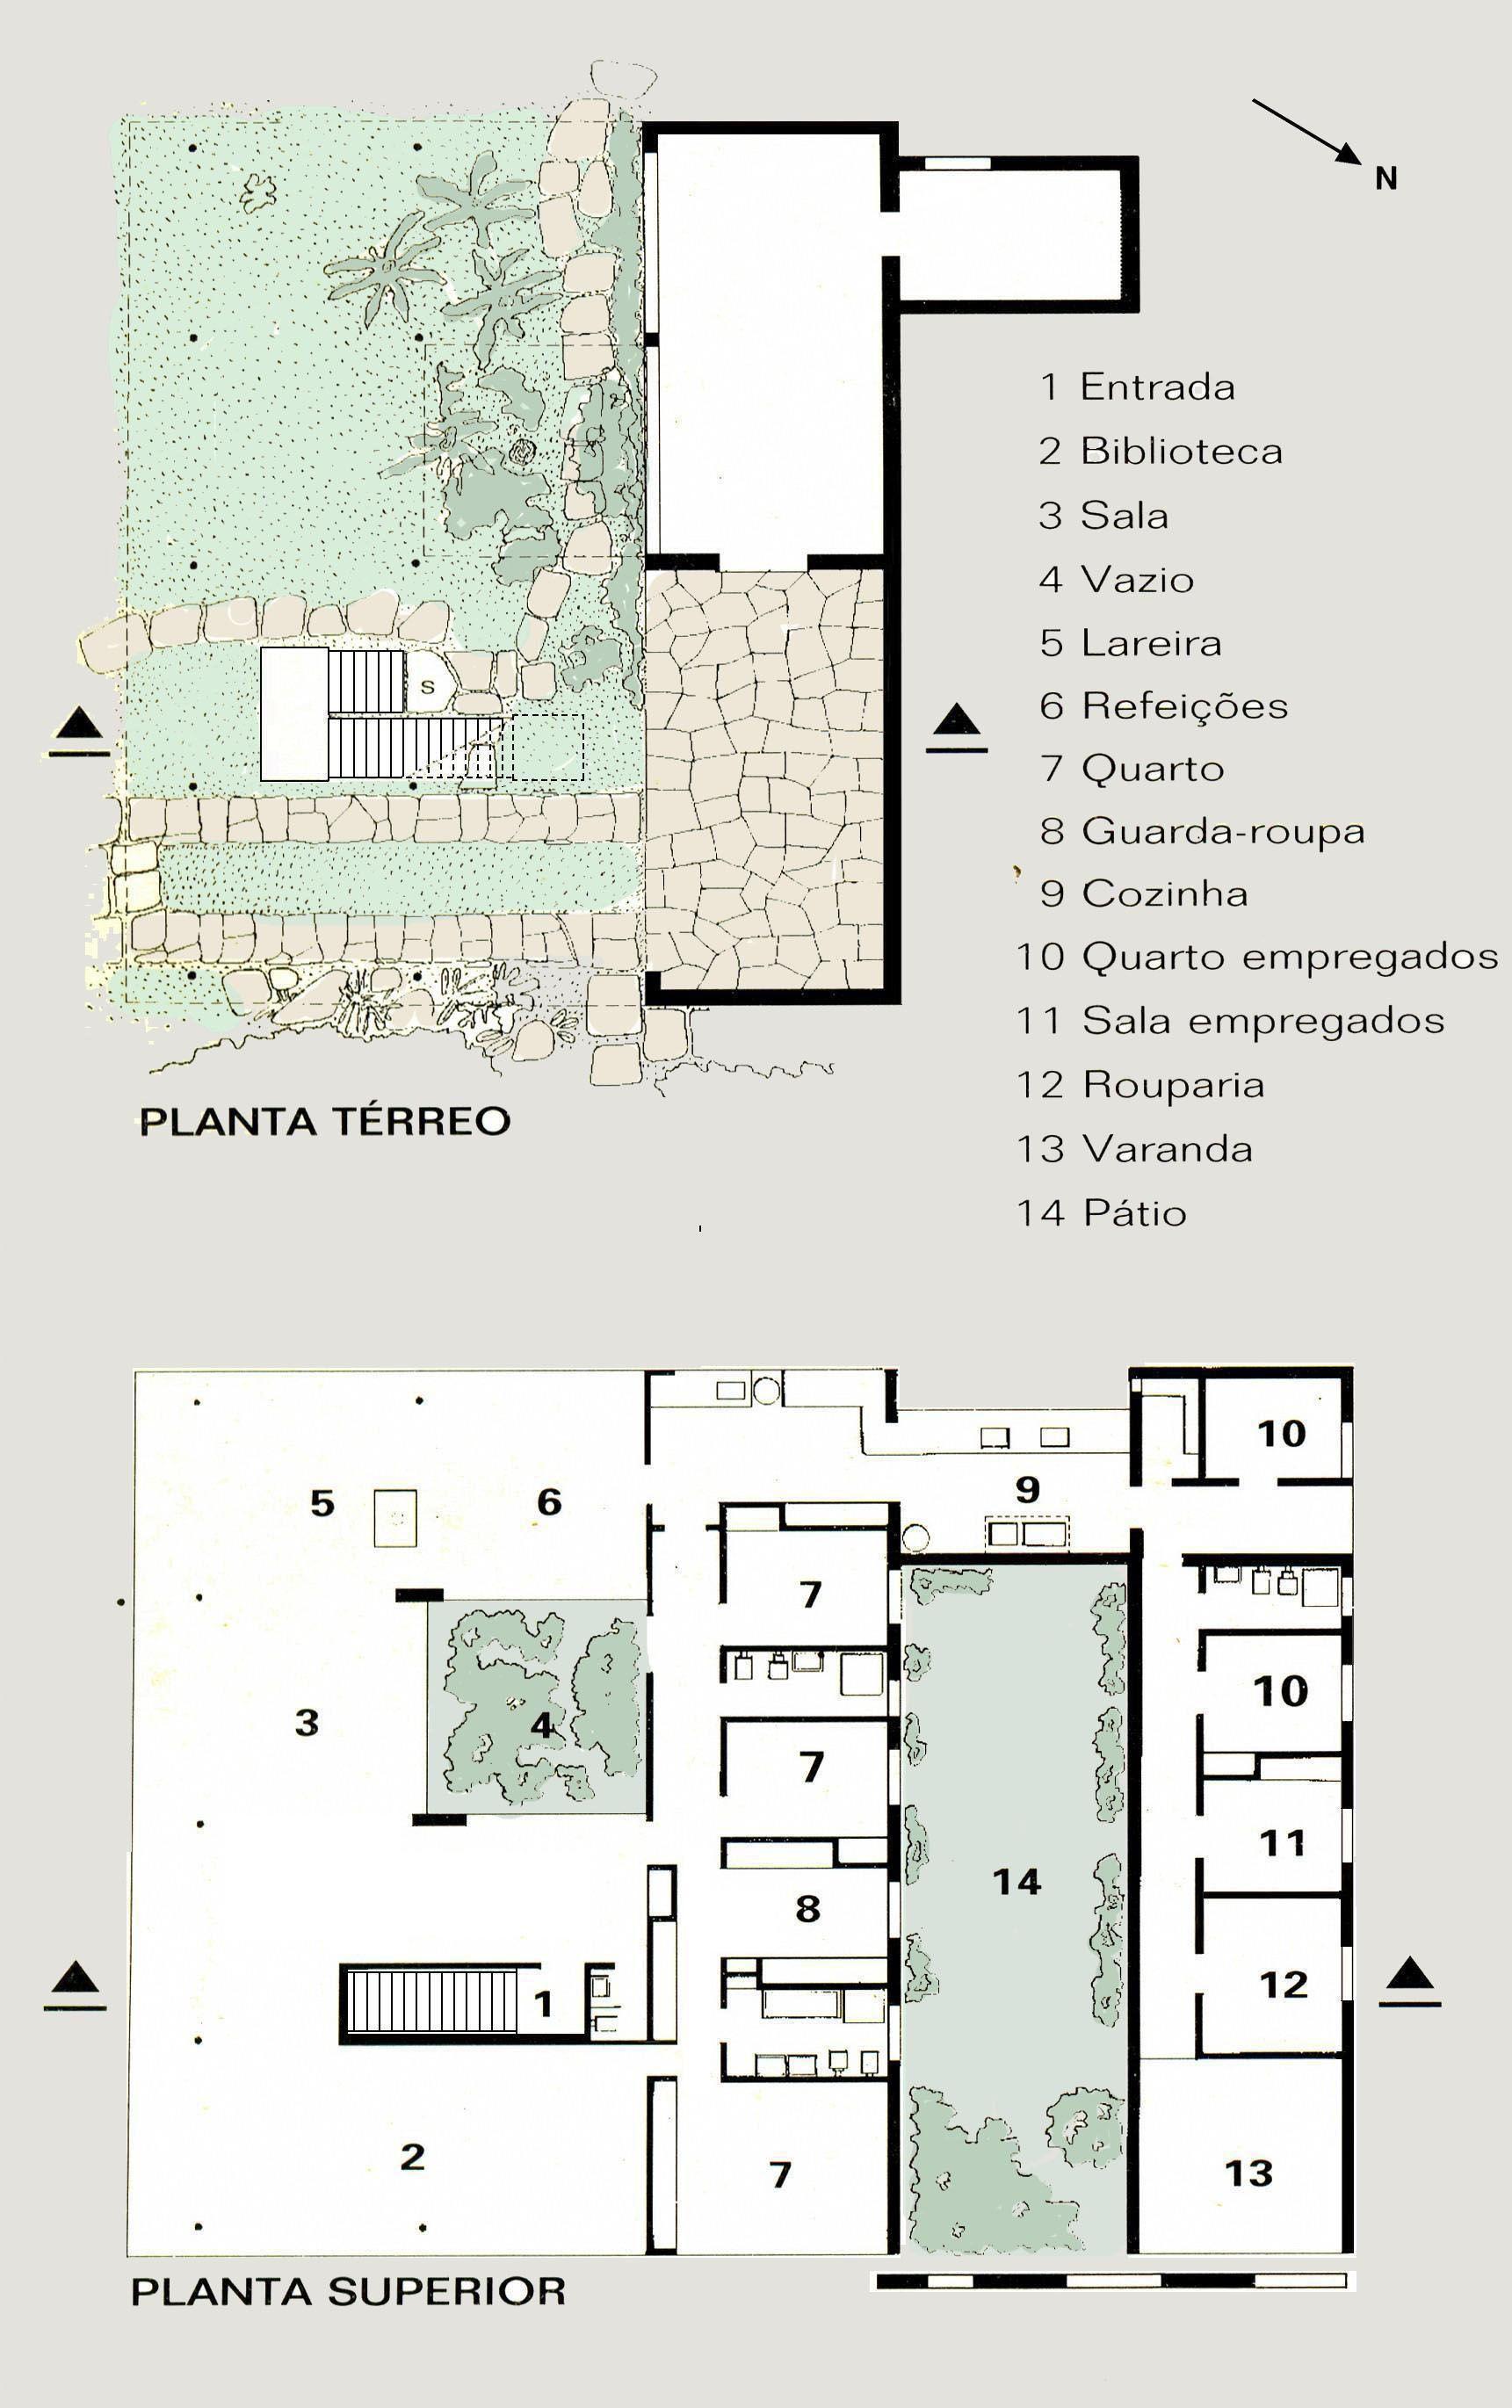 Casa de vidro plantas modern architecture tropical houses casa patio glass house